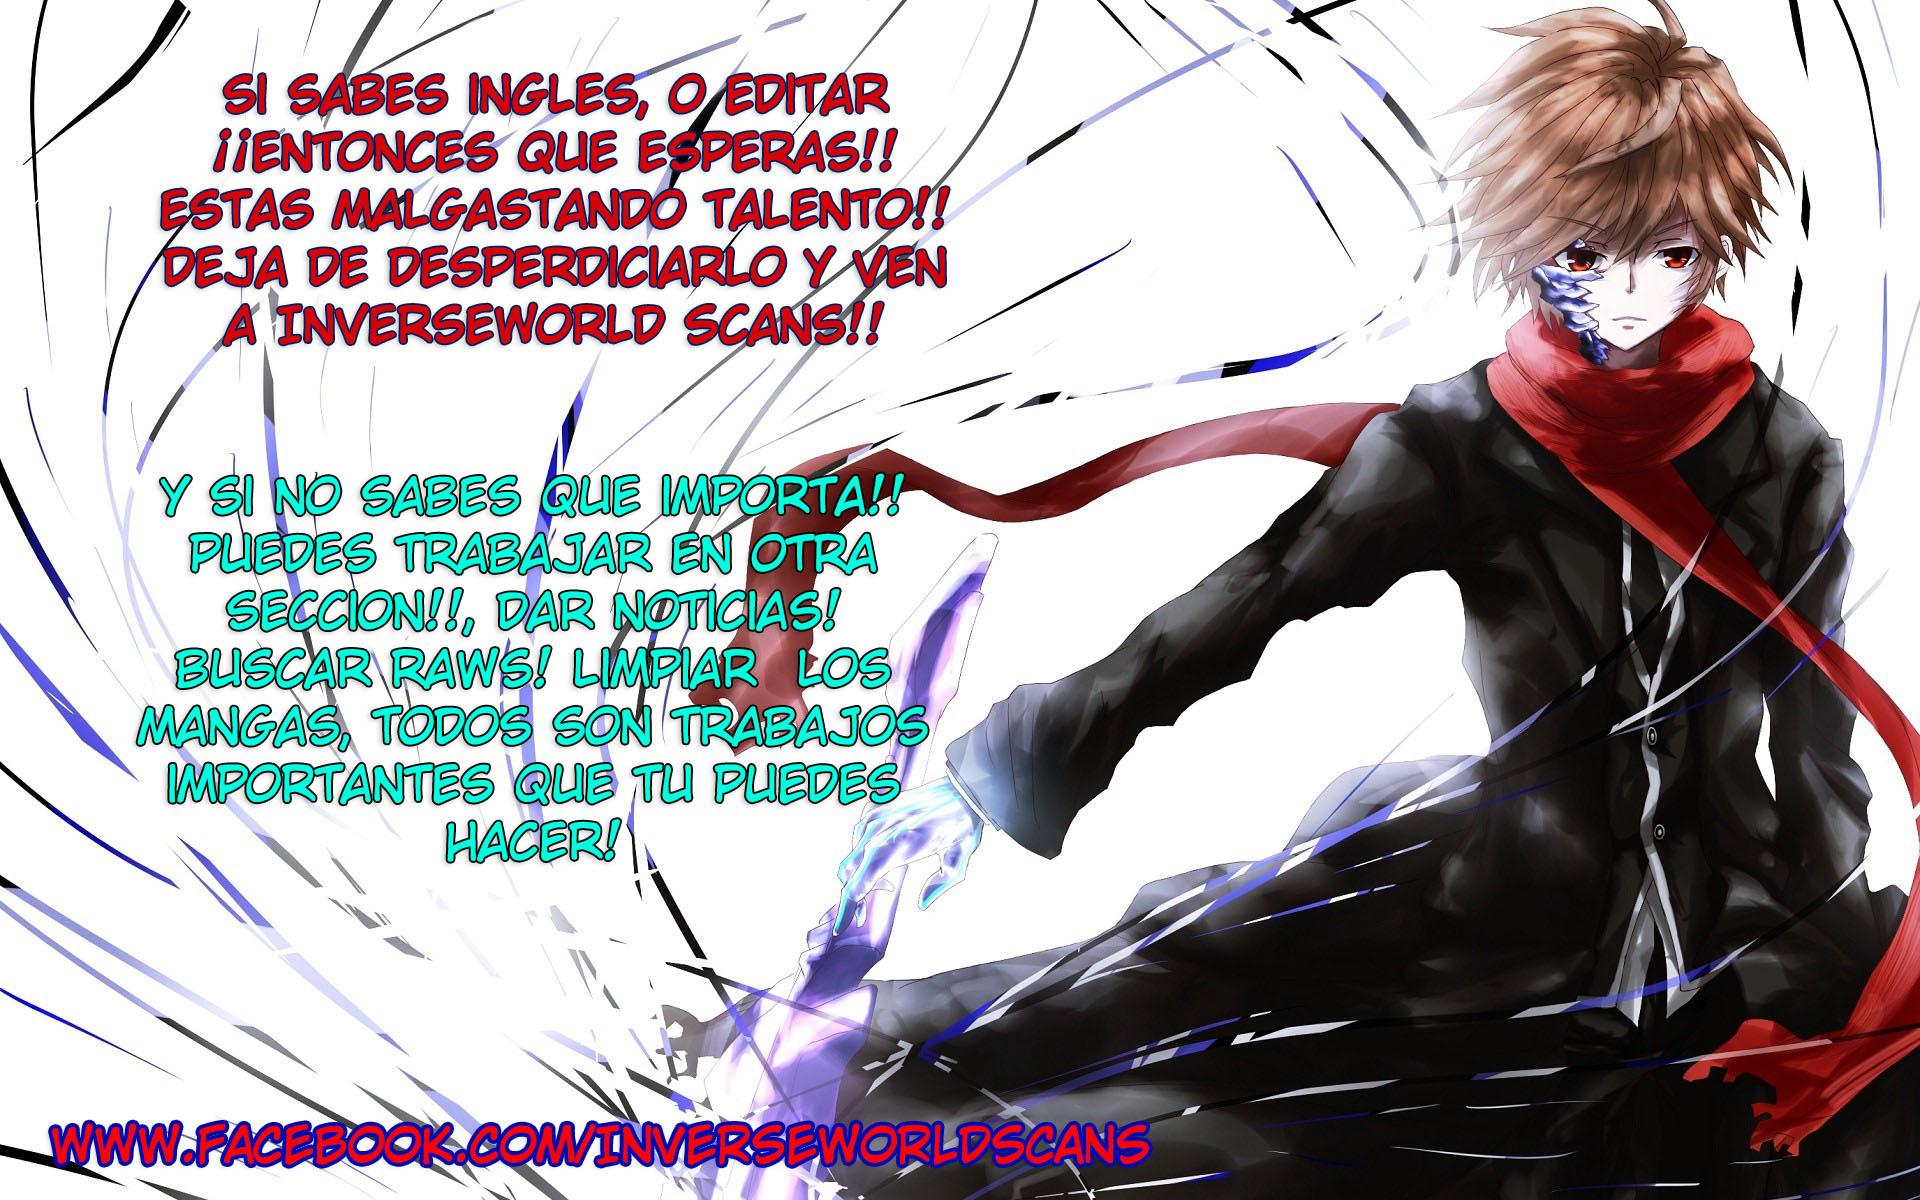 http://c5.ninemanga.com/es_manga/18/16210/415311/e79e1c6ebac379728f42317dc40fa485.jpg Page 3